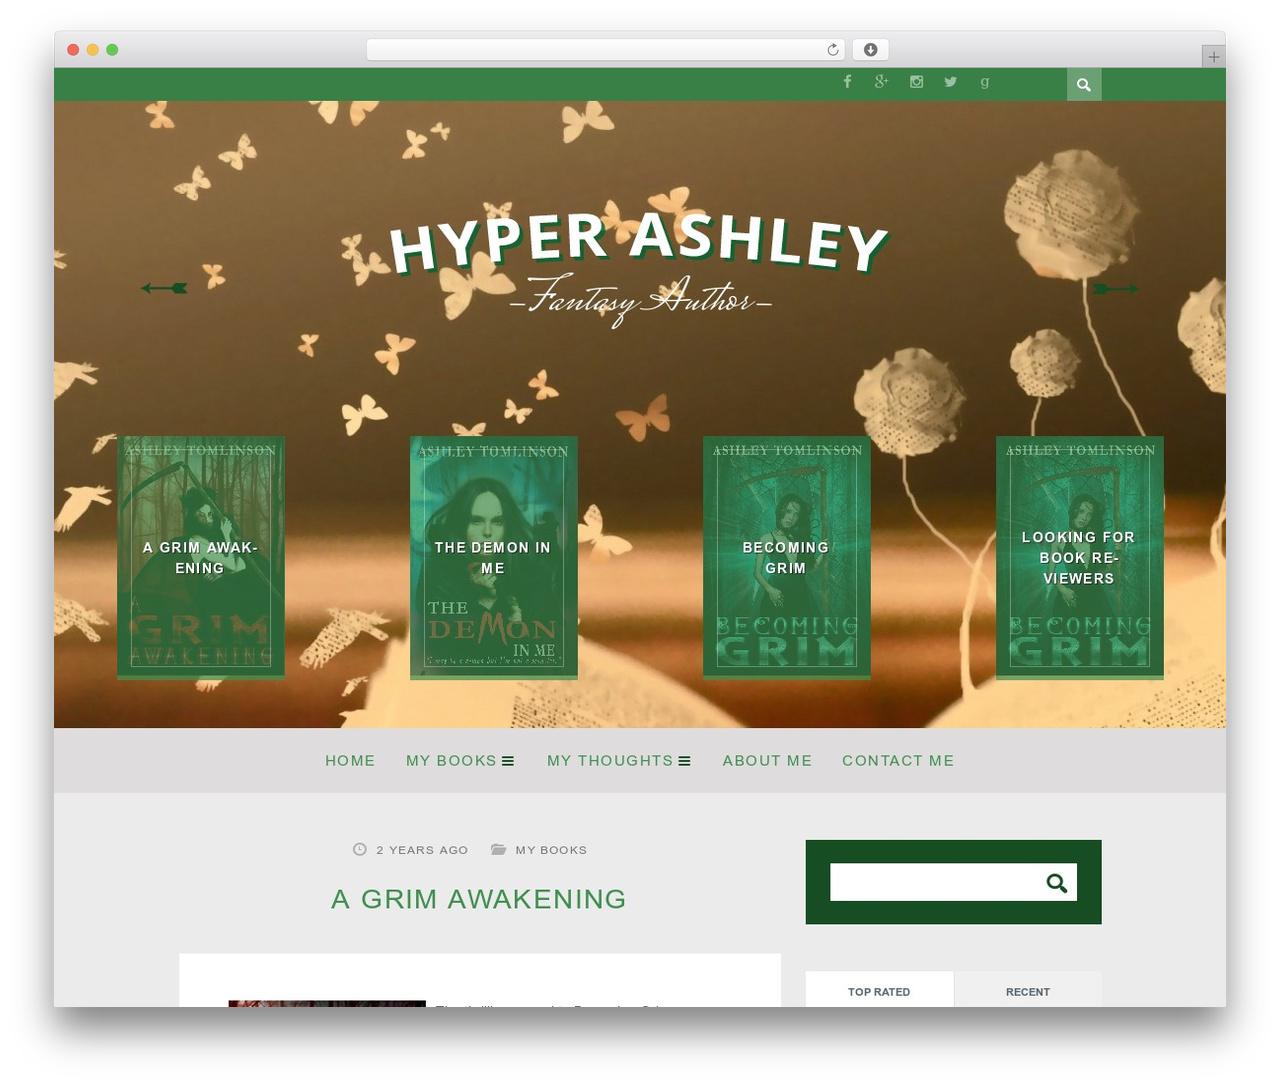 WordPress theme ST Squirrel - hyperashley.com